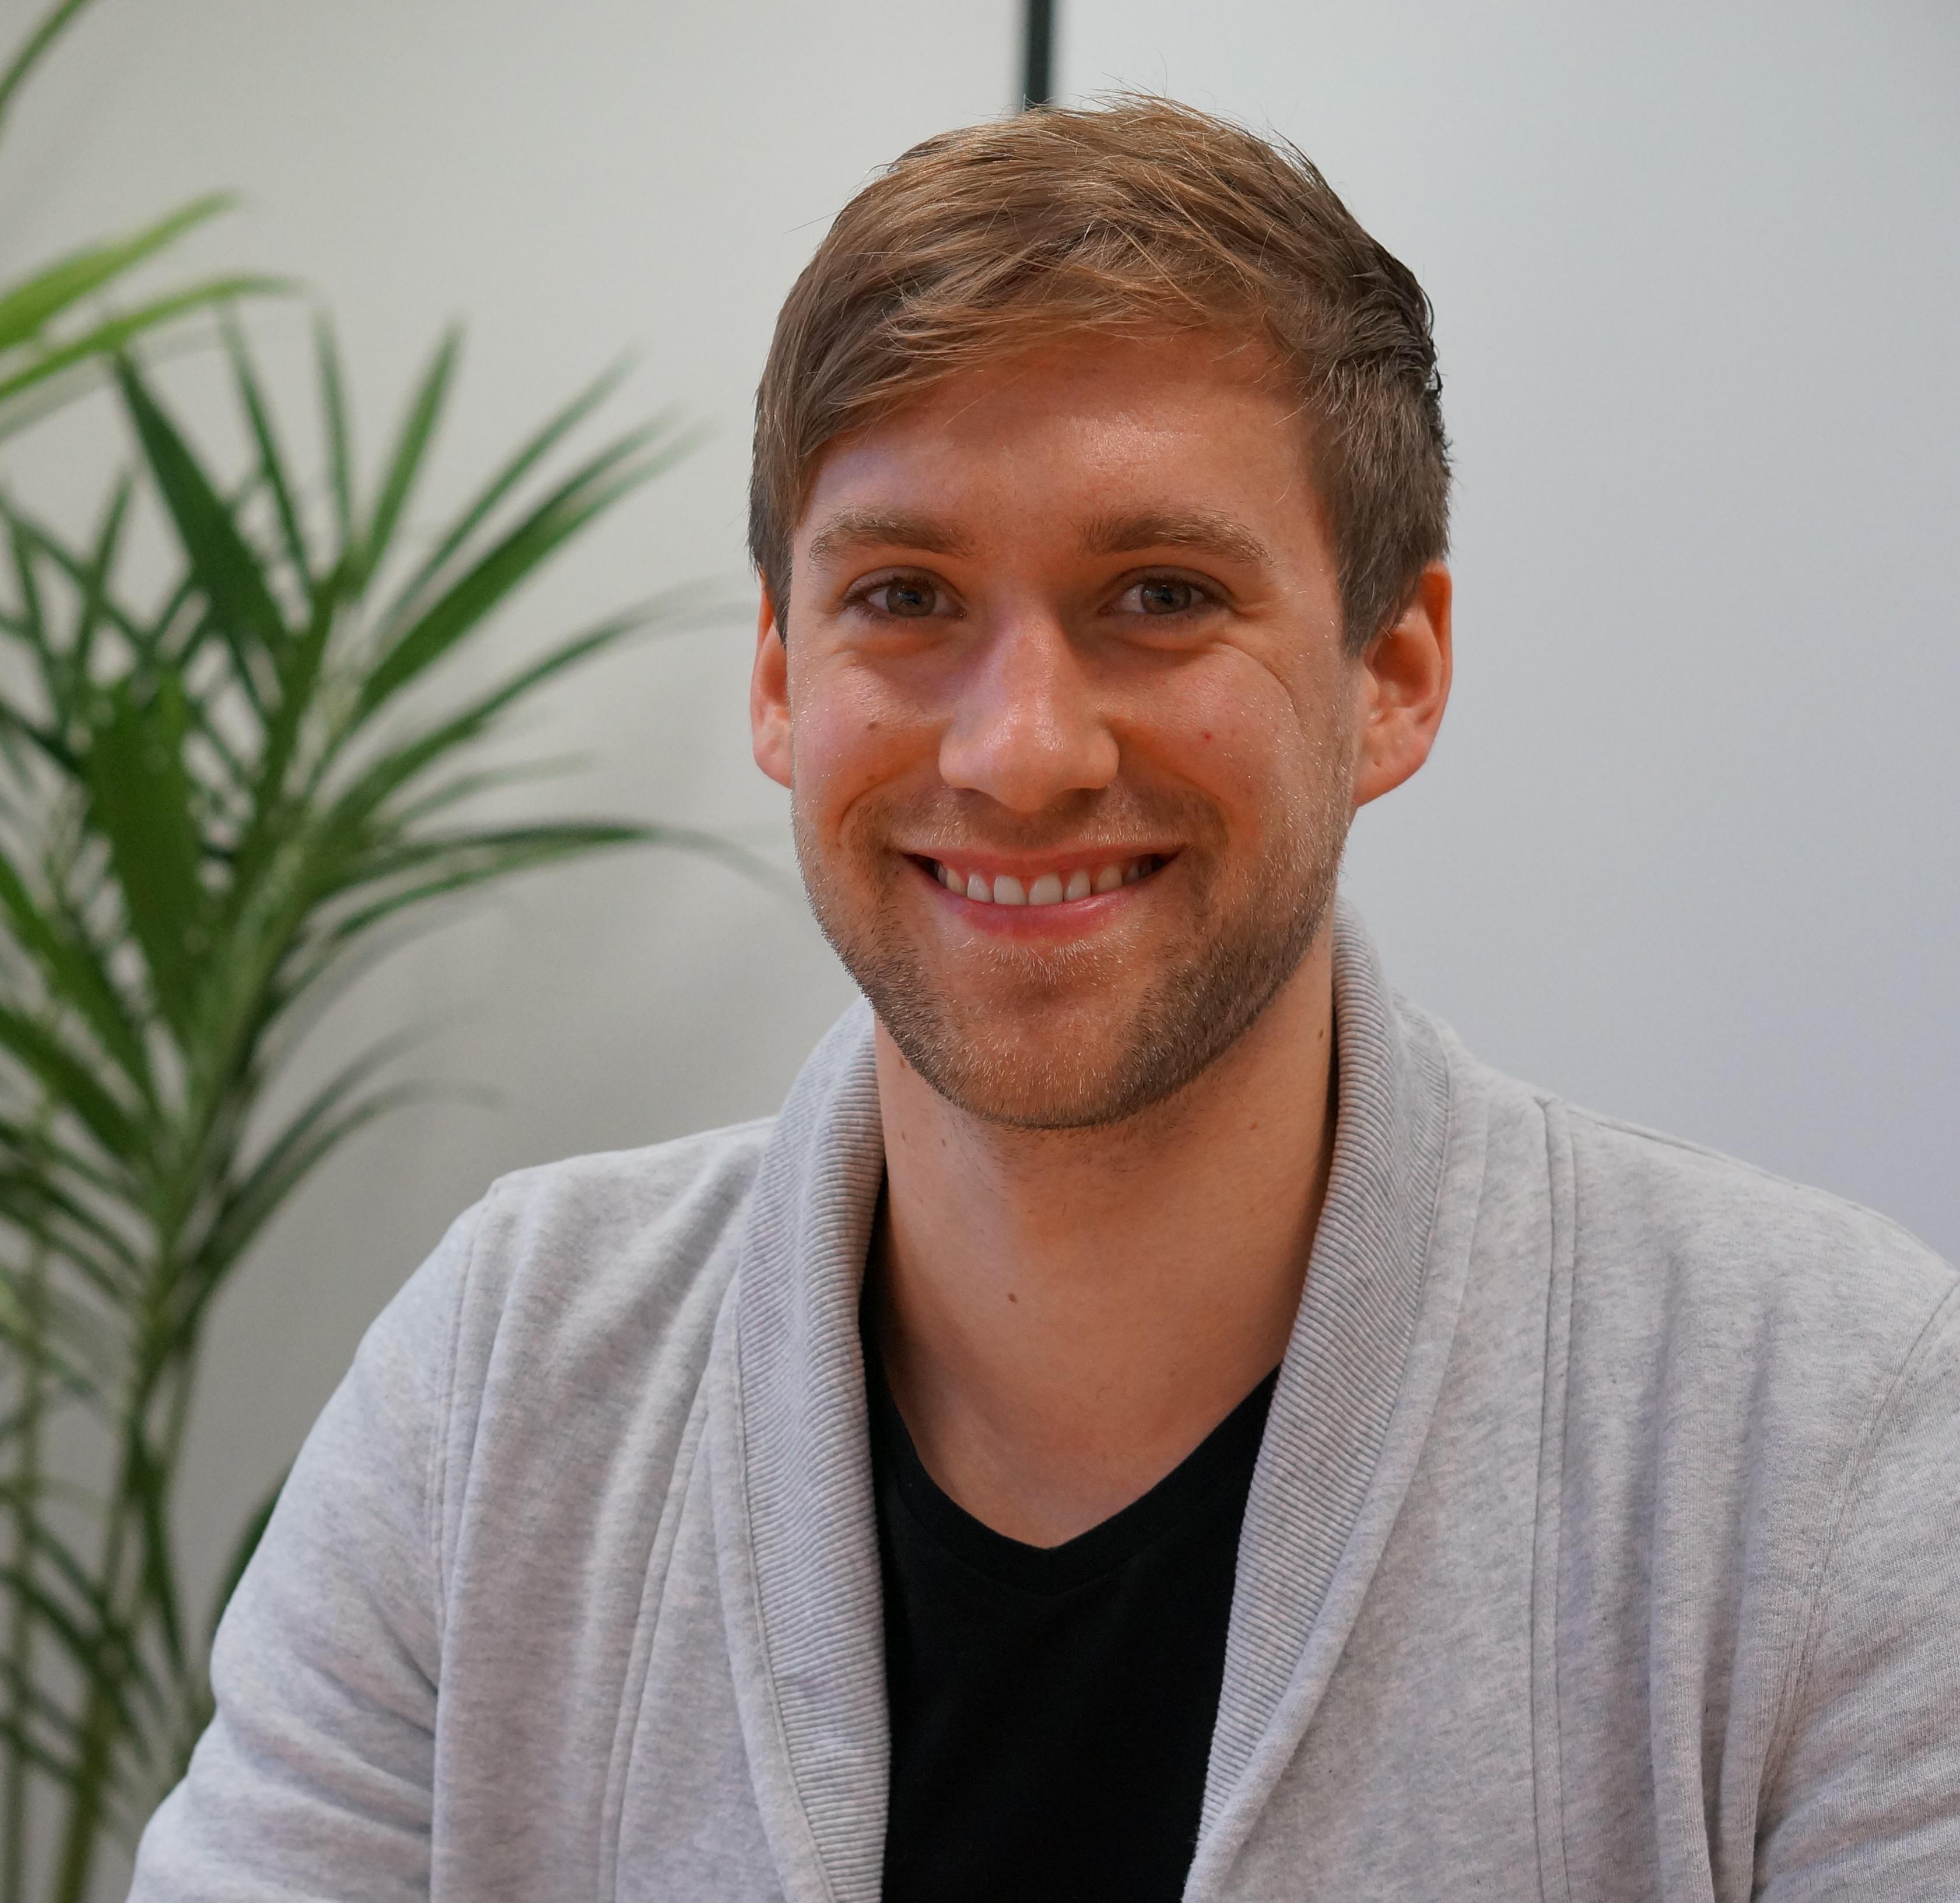 Kevin Schulte